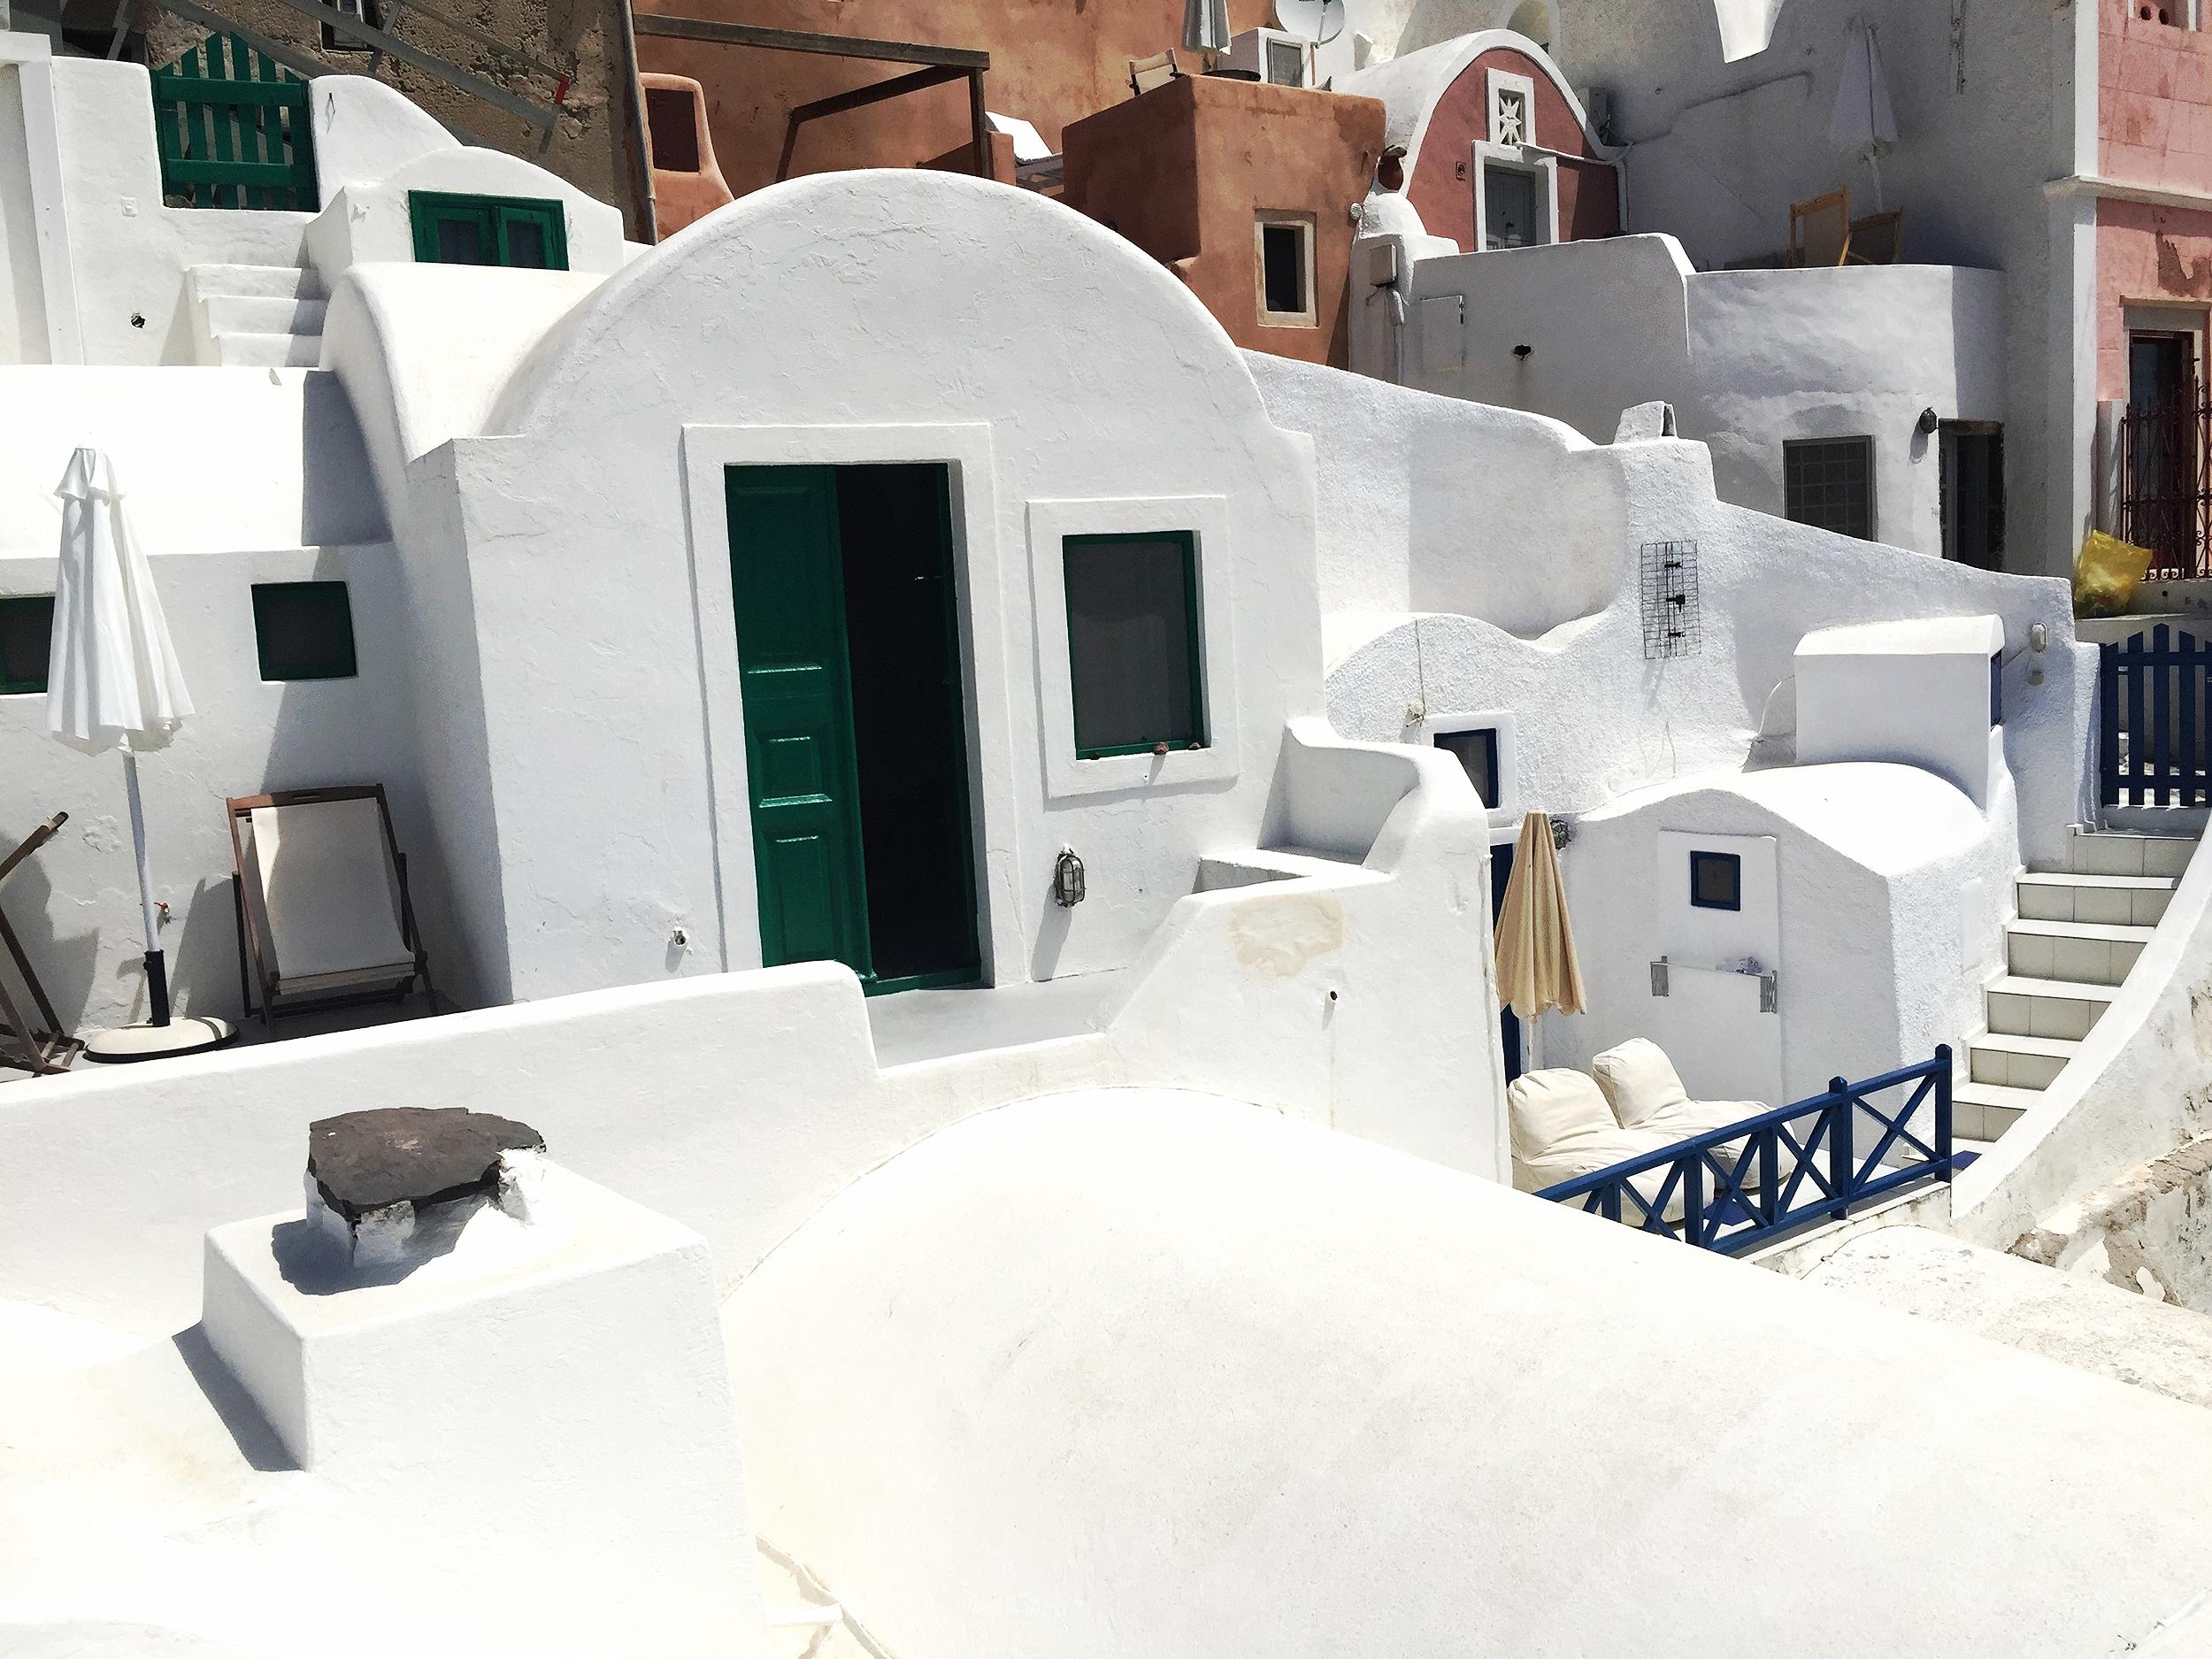 The Greek Islands: Santorini | Sea of Atlas